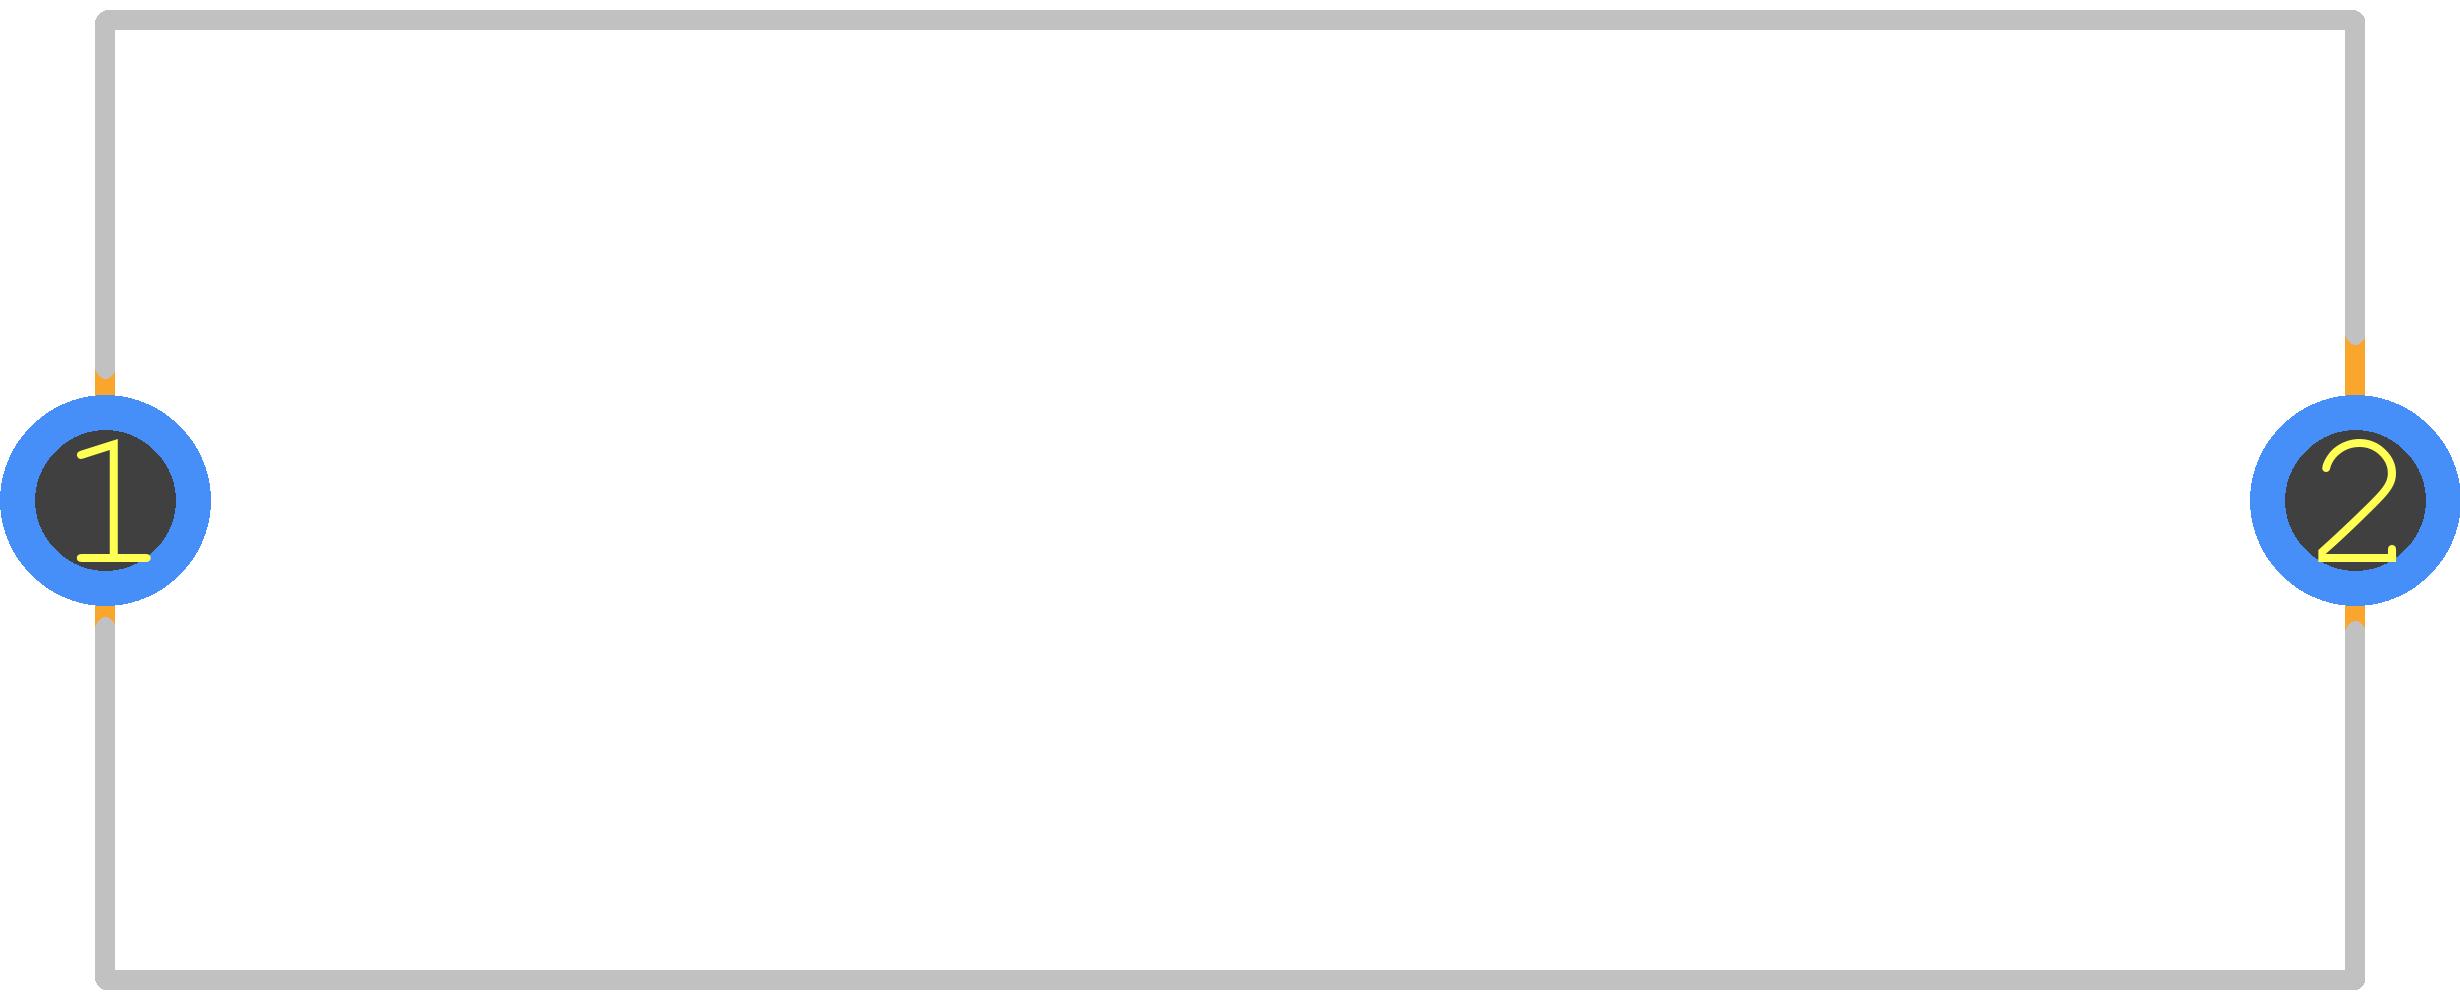 0031.8201 - SCHURTER PCB footprint - Other - 0031.8201